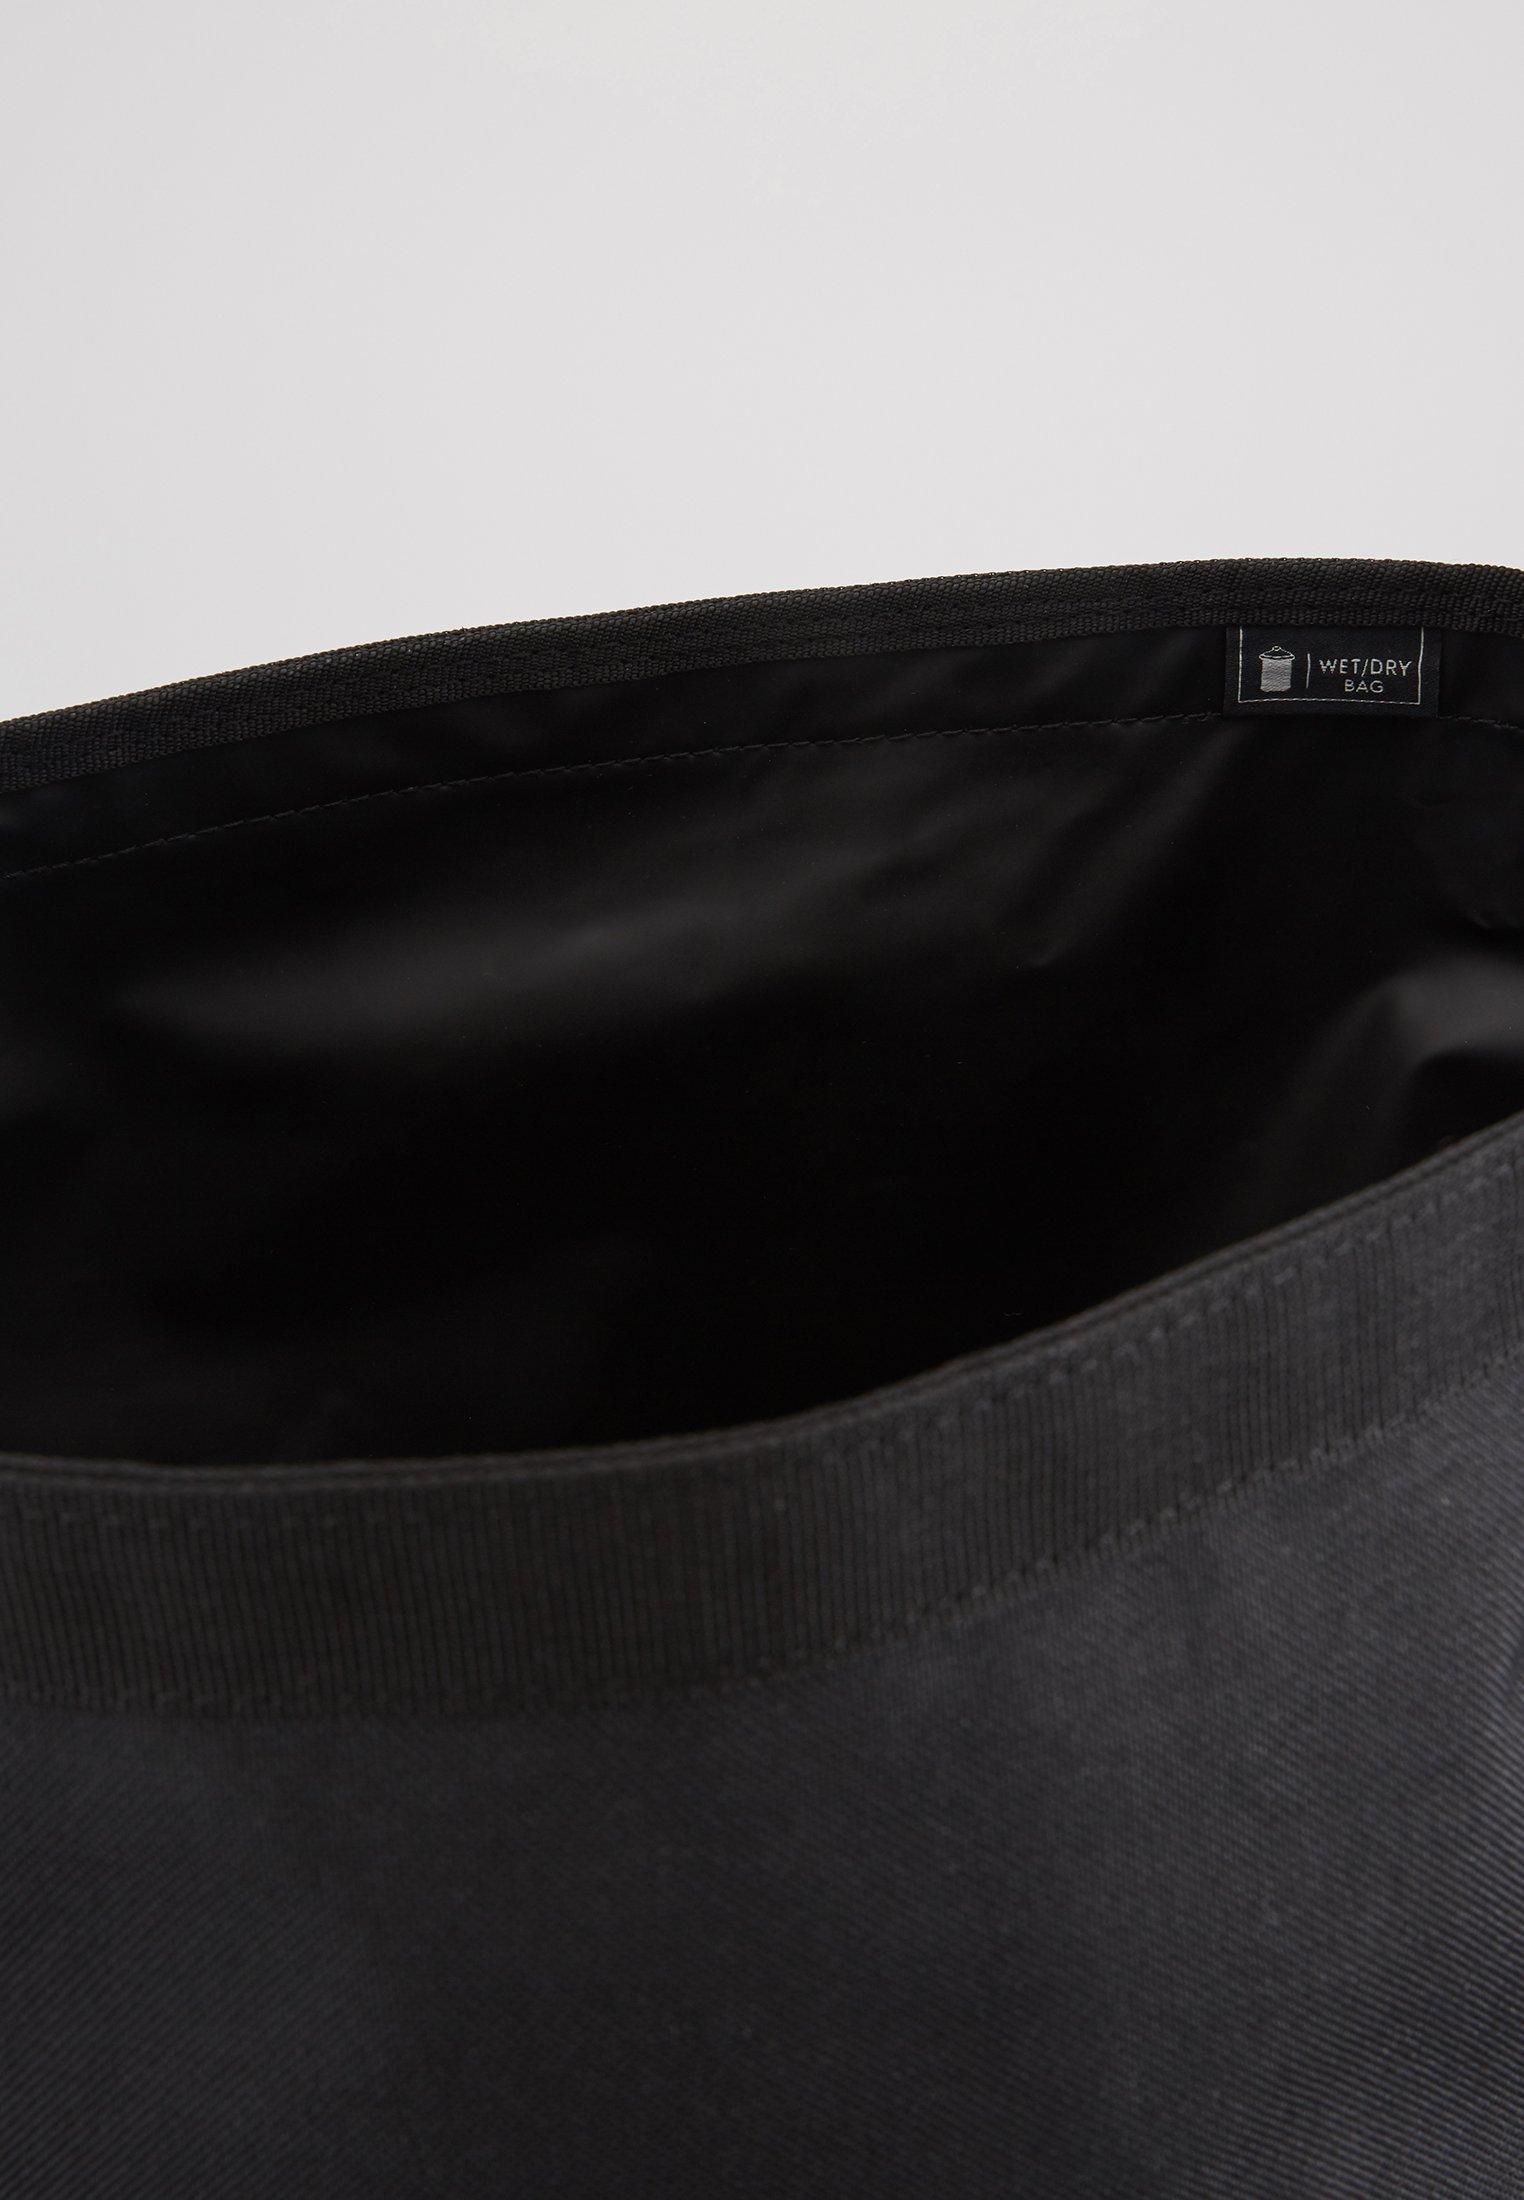 Billabong Venture Pack - Rucksack Black